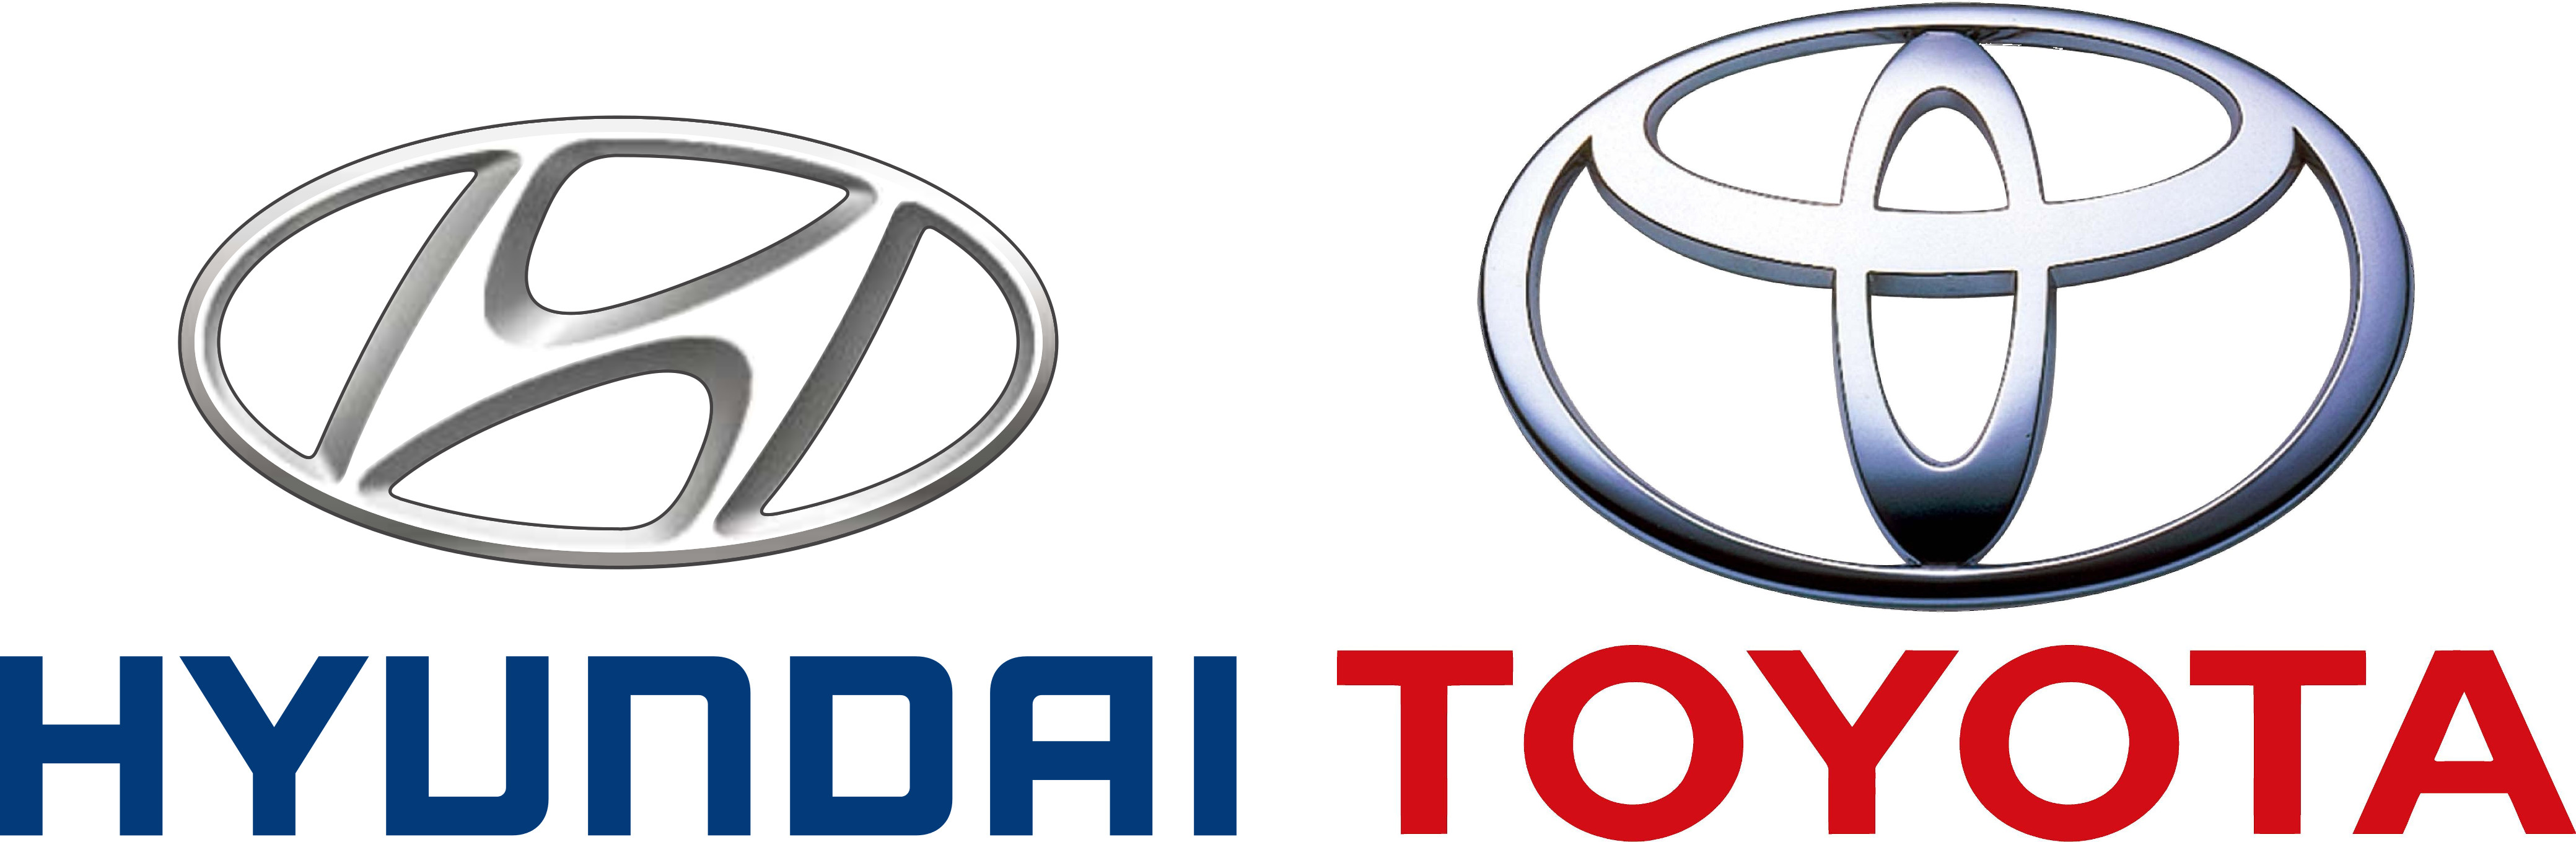 Hyundai Motor, Toyota Record Highest Hybrid Car Sales in History -  Businesskorea